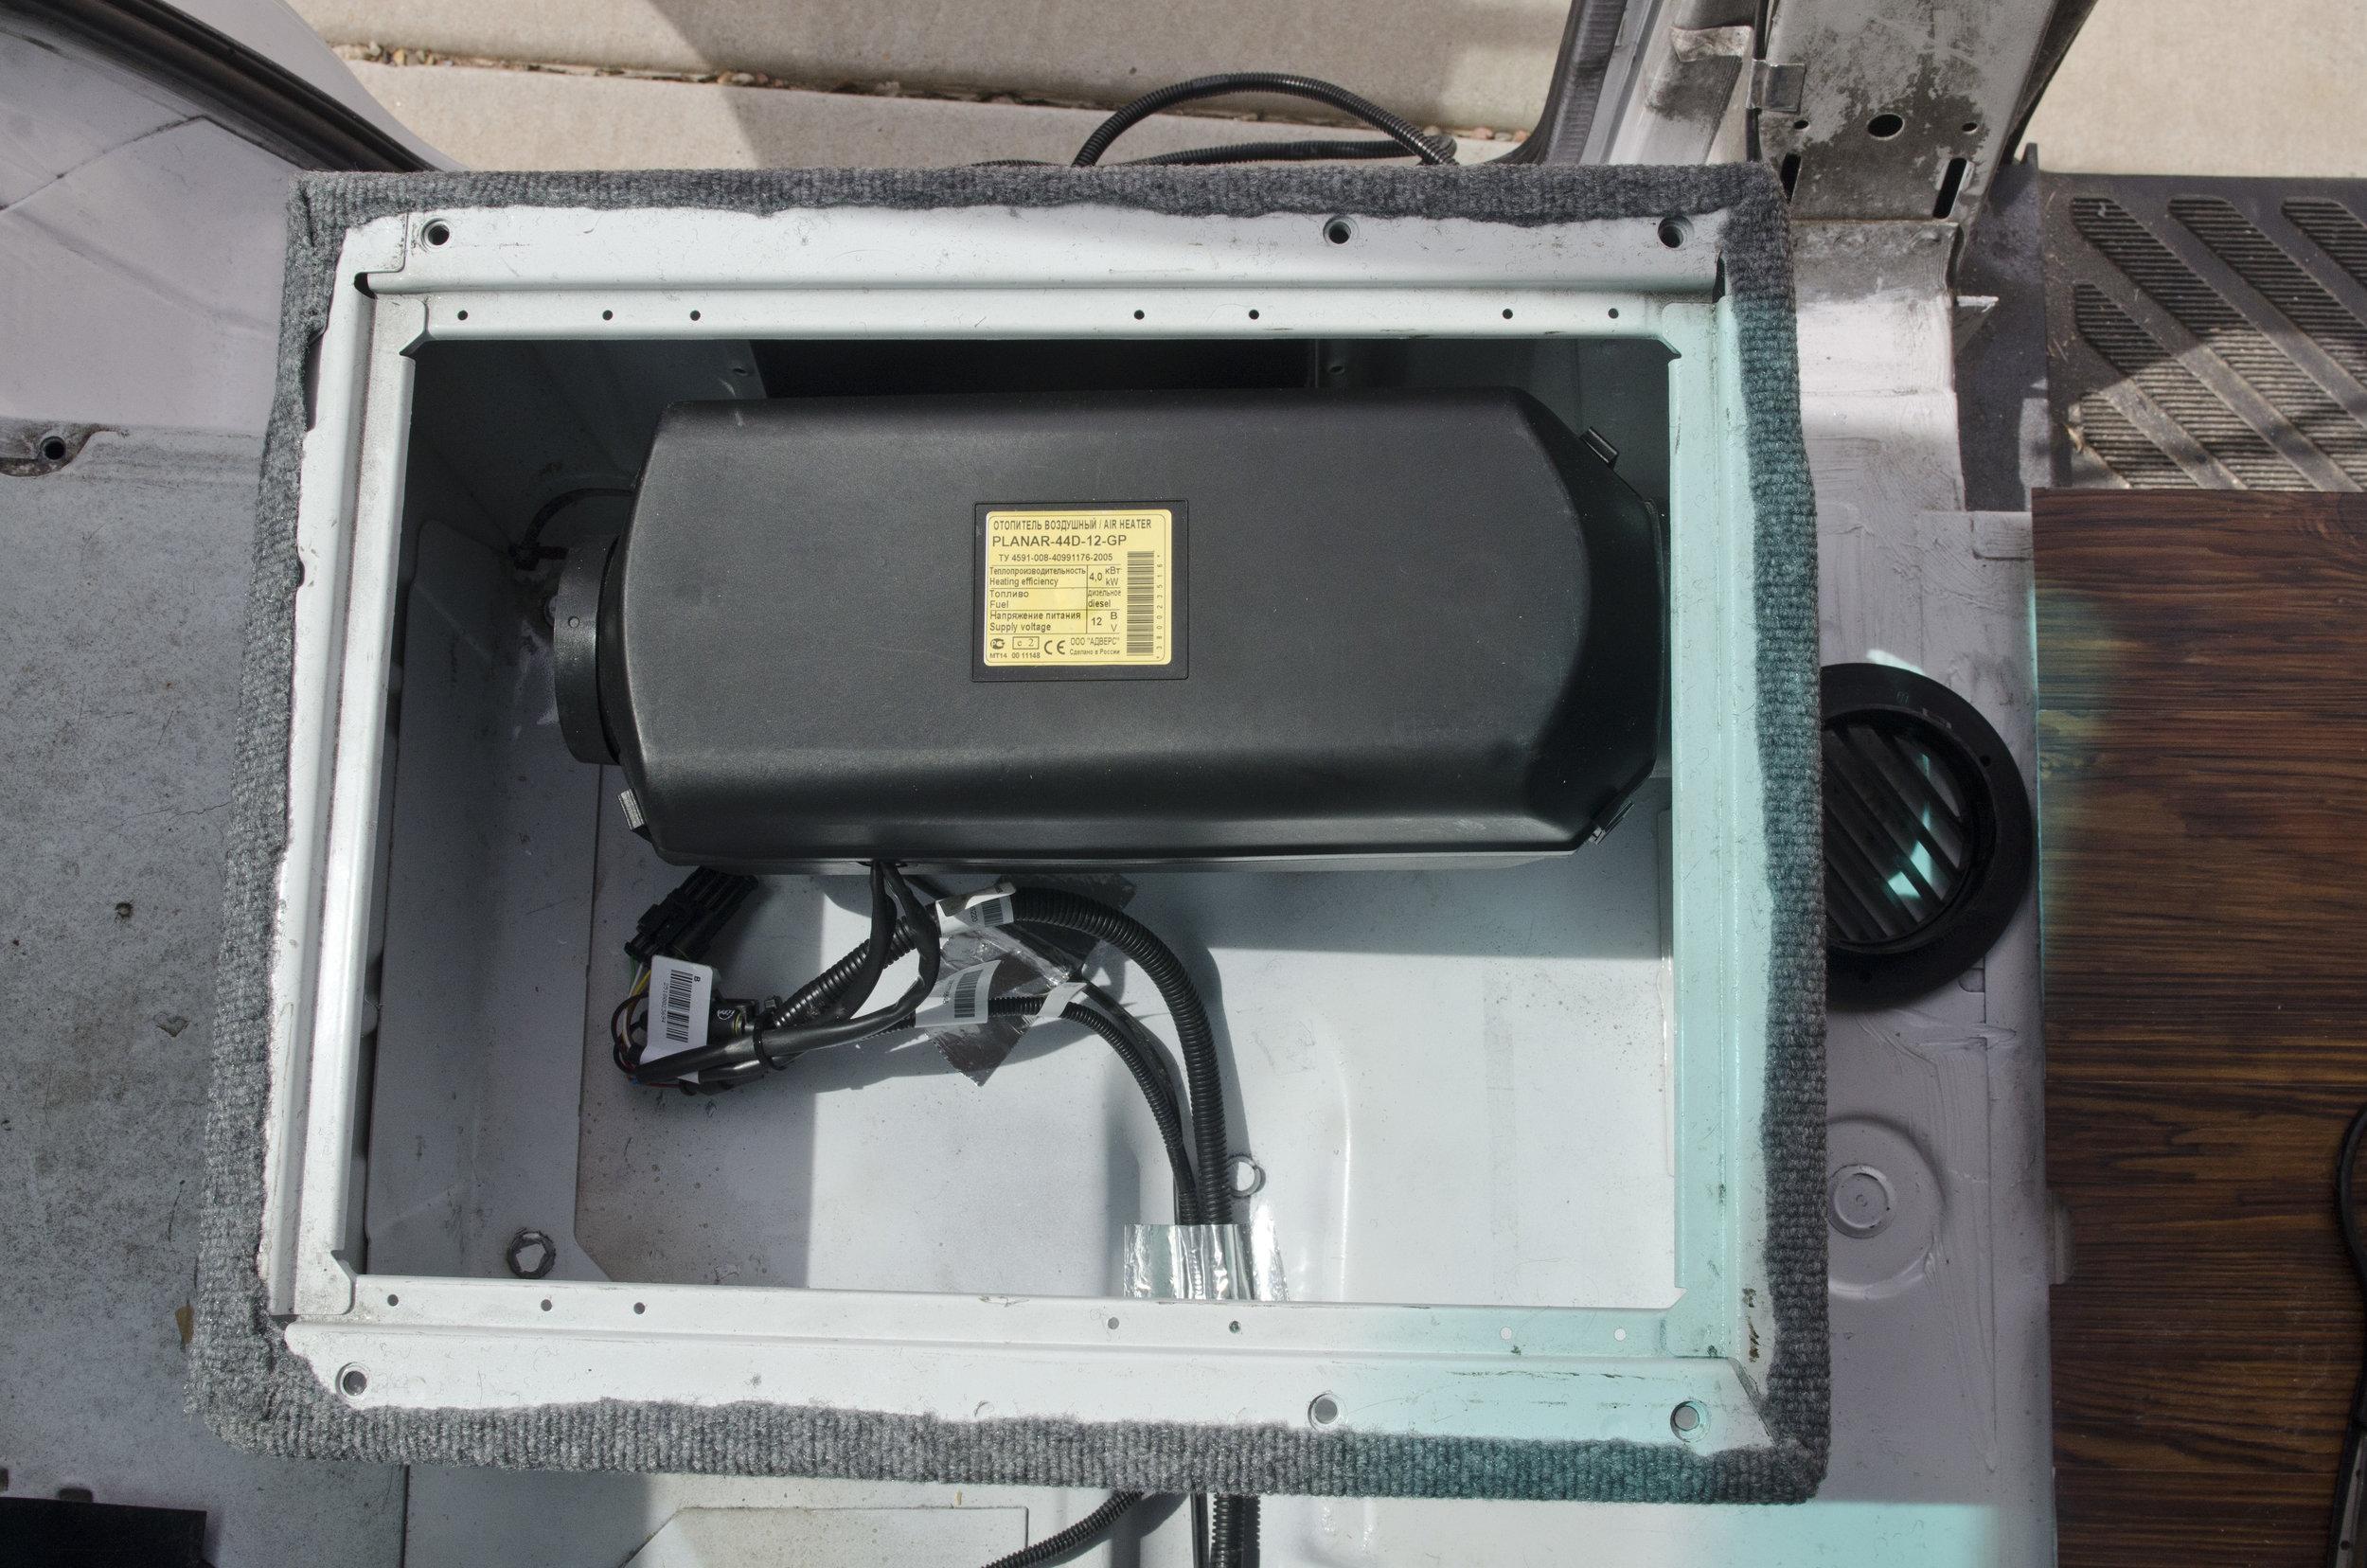 Installing our diesel heater under the passenger seat